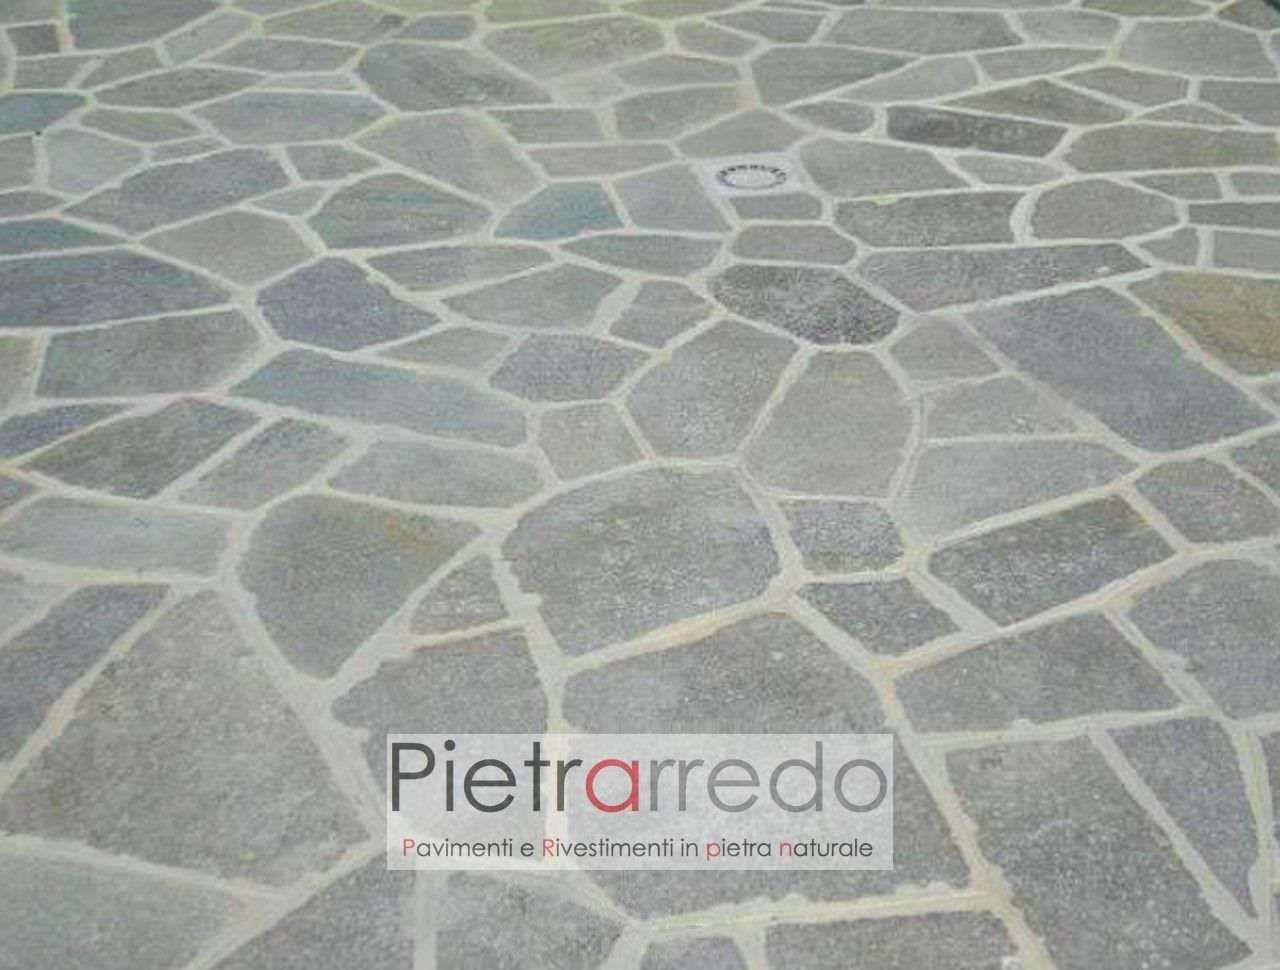 Pavimento In Pietra Naturale Luserna Mosaico Lastrame Opus Incertum Spessore 2 4cm Nel 2020 Pavimento In Pietra Pavimenti Pietre Naturali